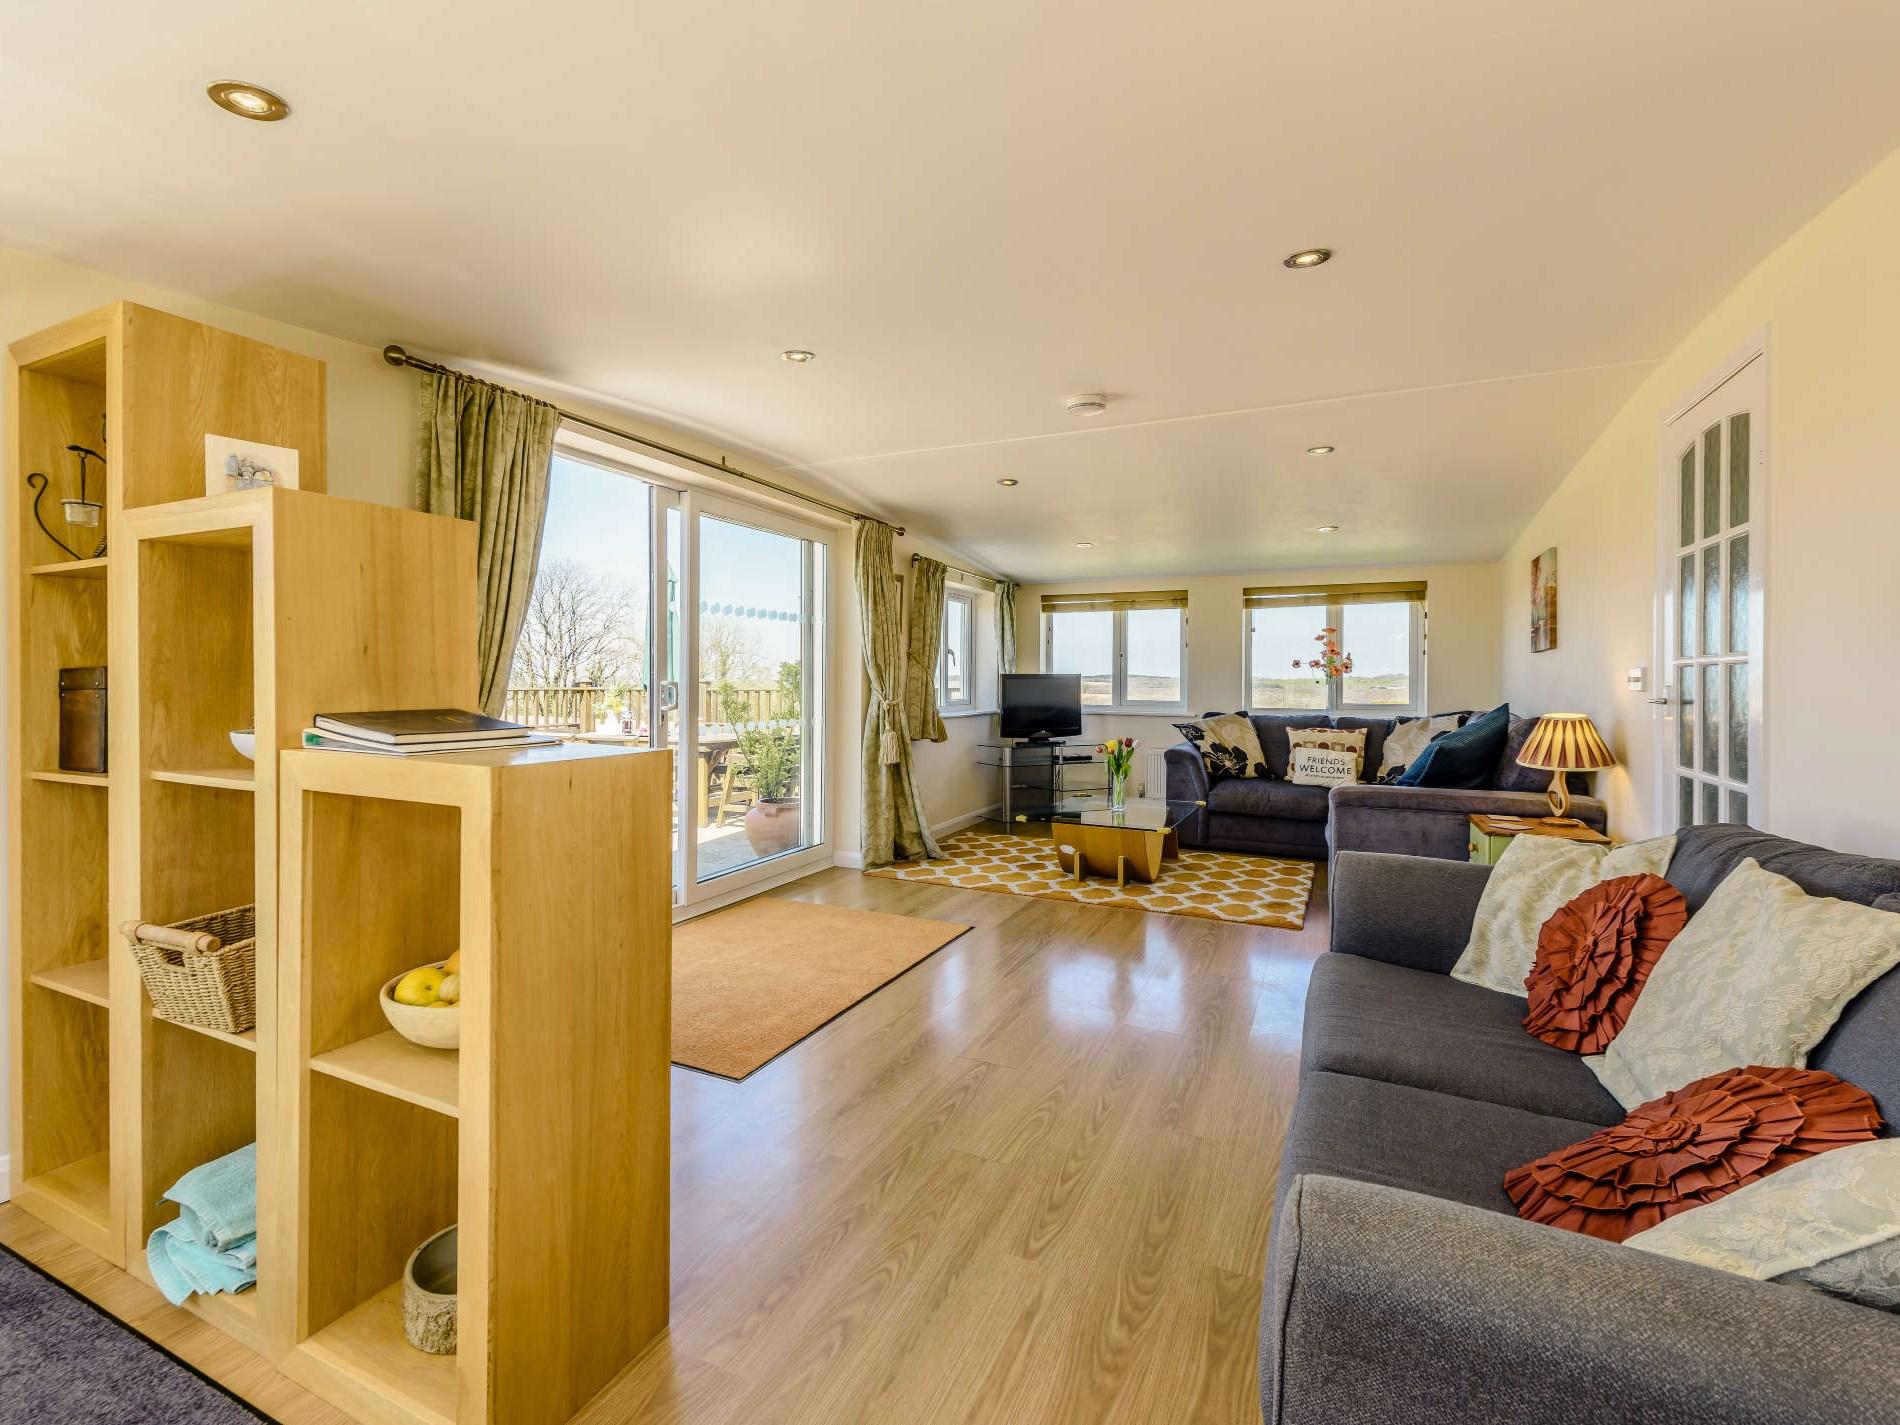 2 Bedroom Barn in Mid and East Devon, Devon